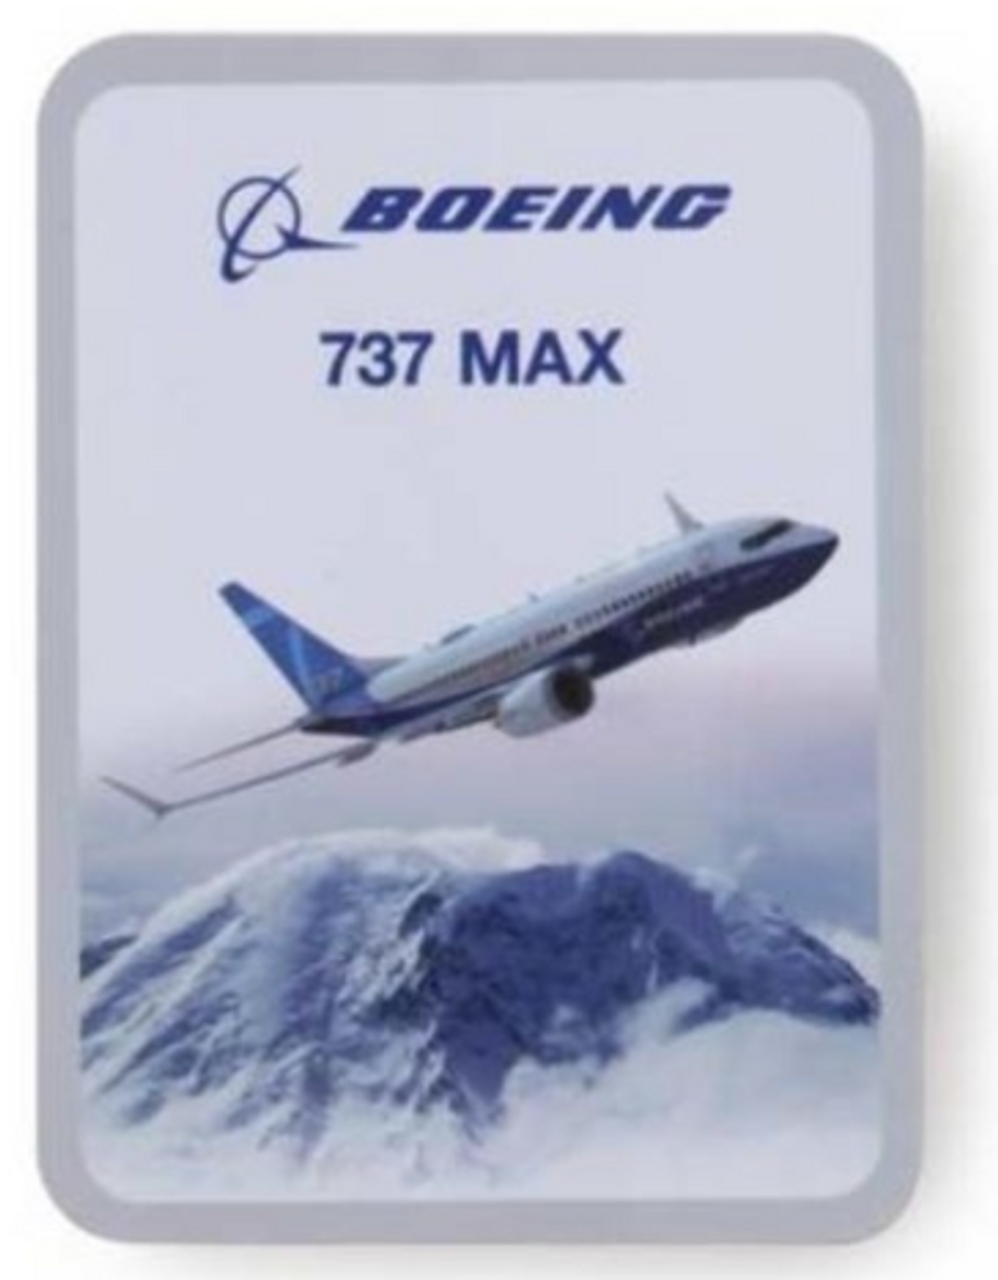 Boeing Endeavors 737 MAX Sticker